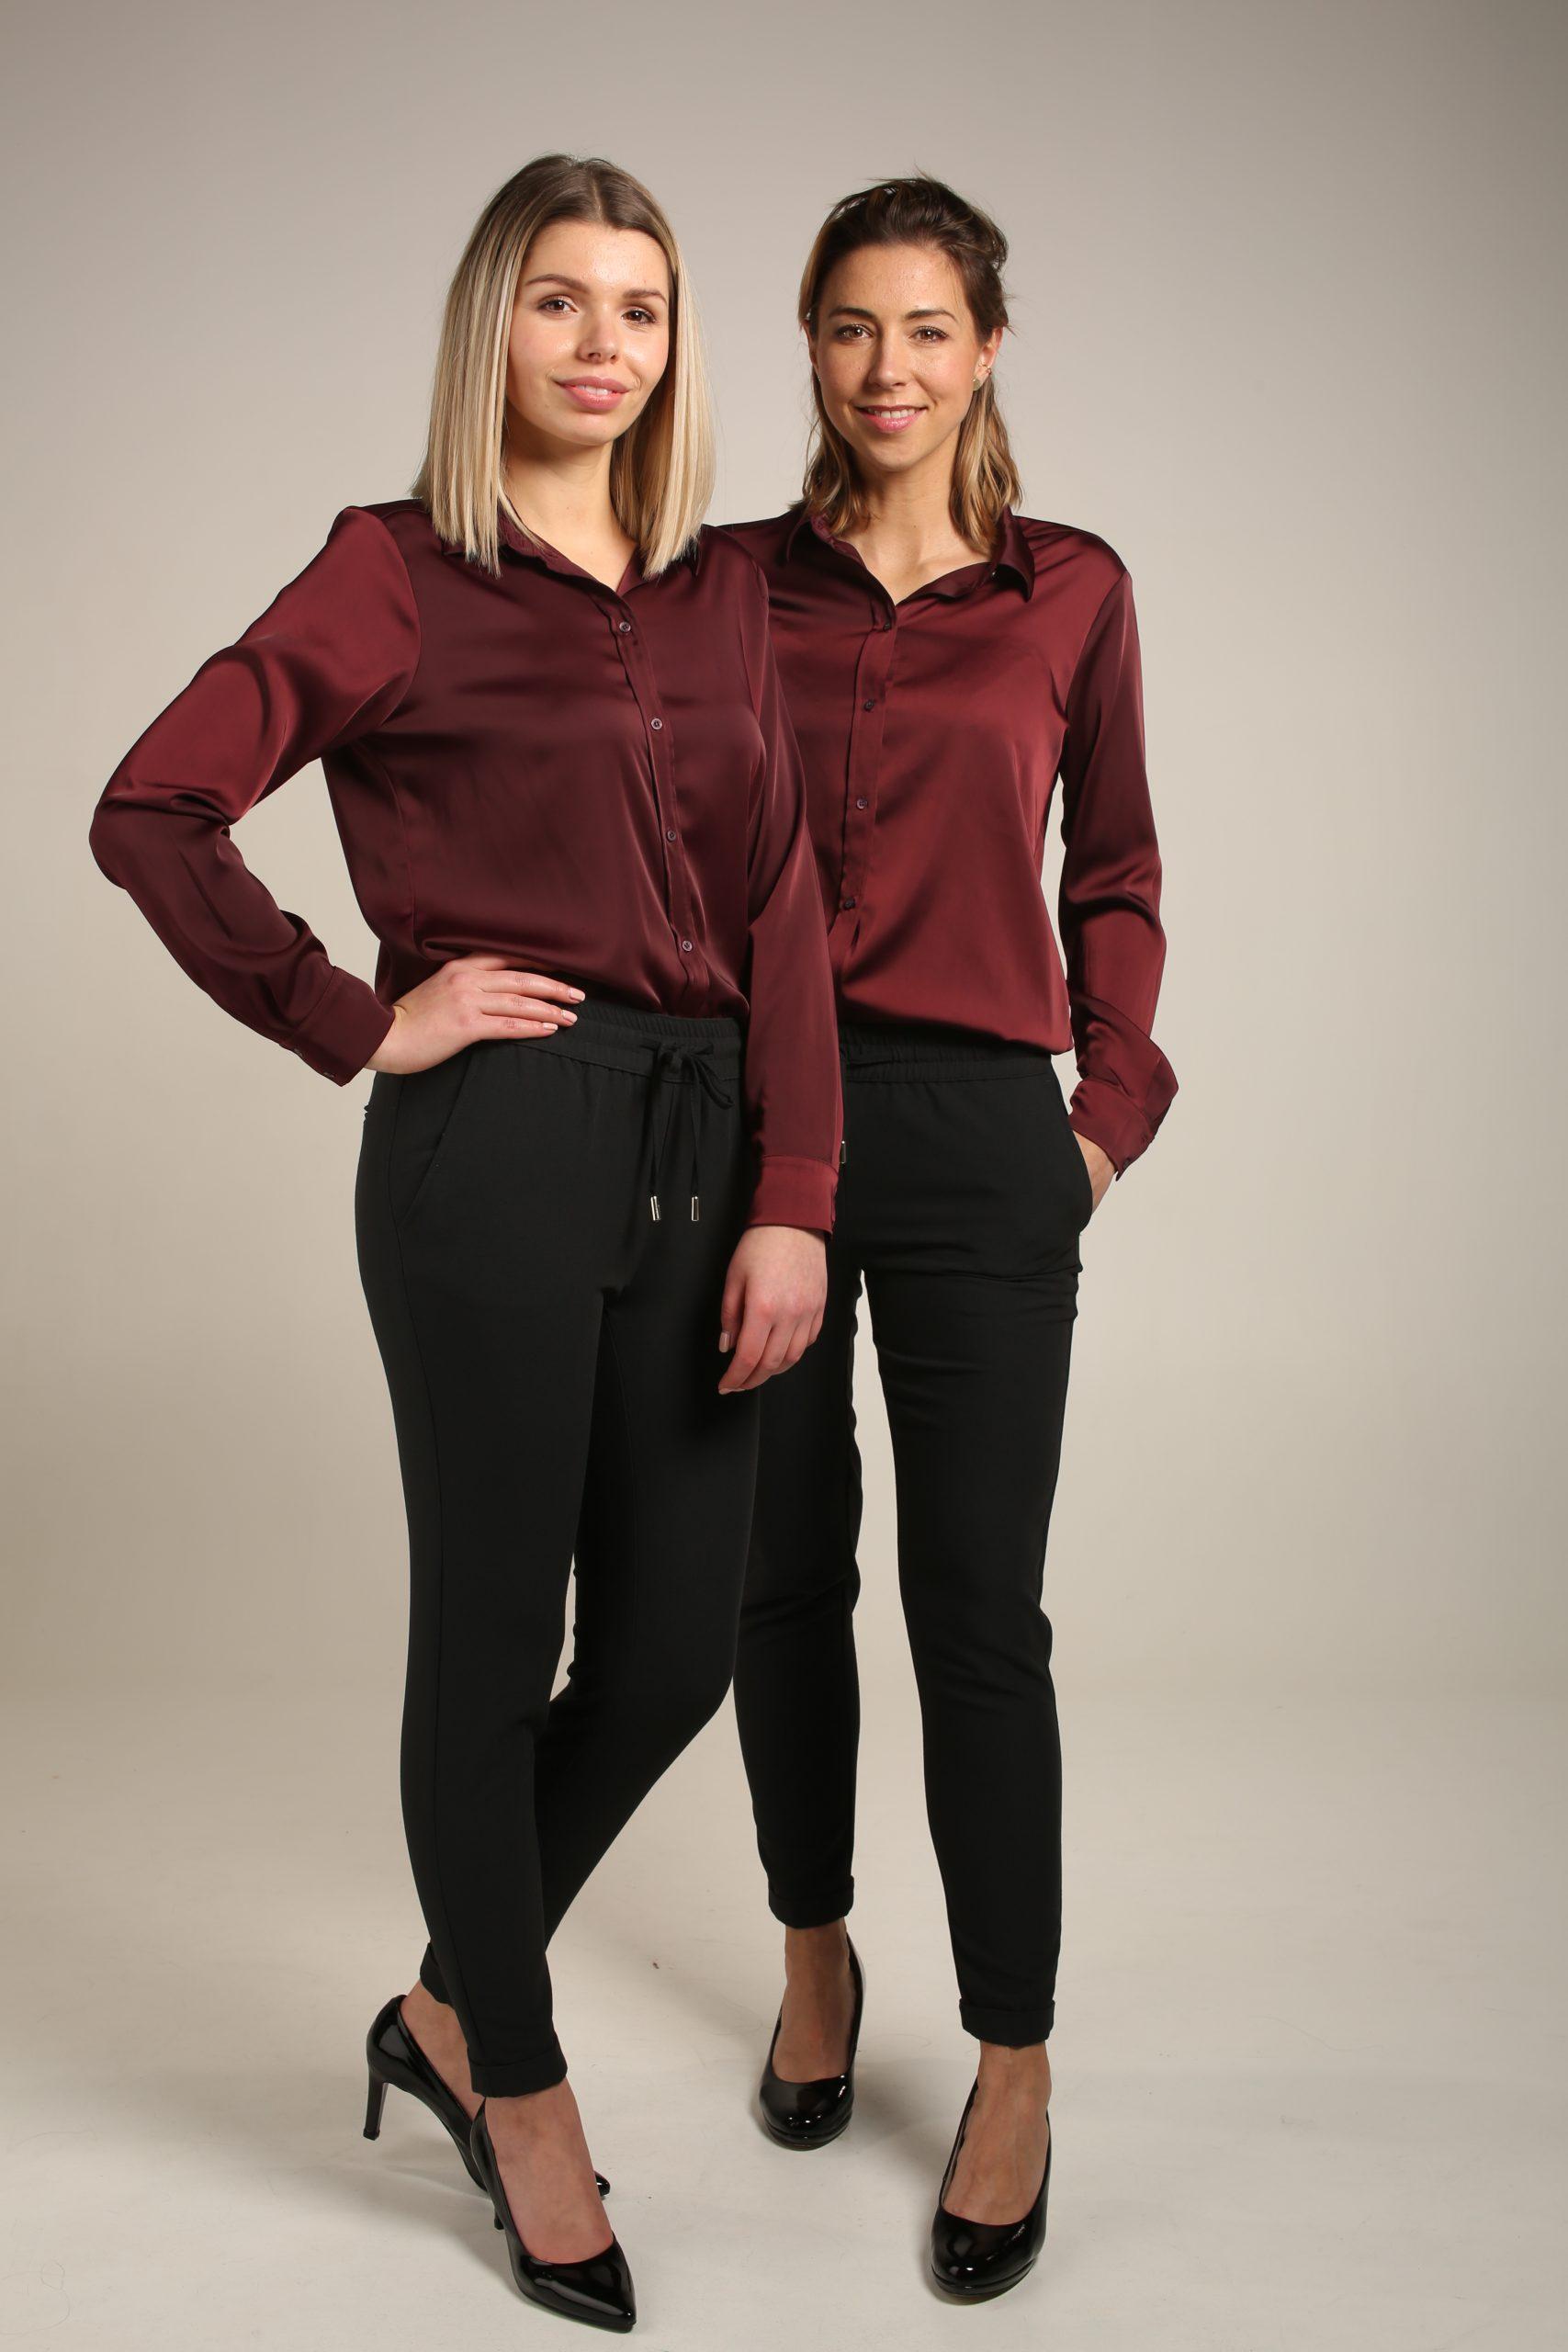 Zwarte broek & Bordeau blouse